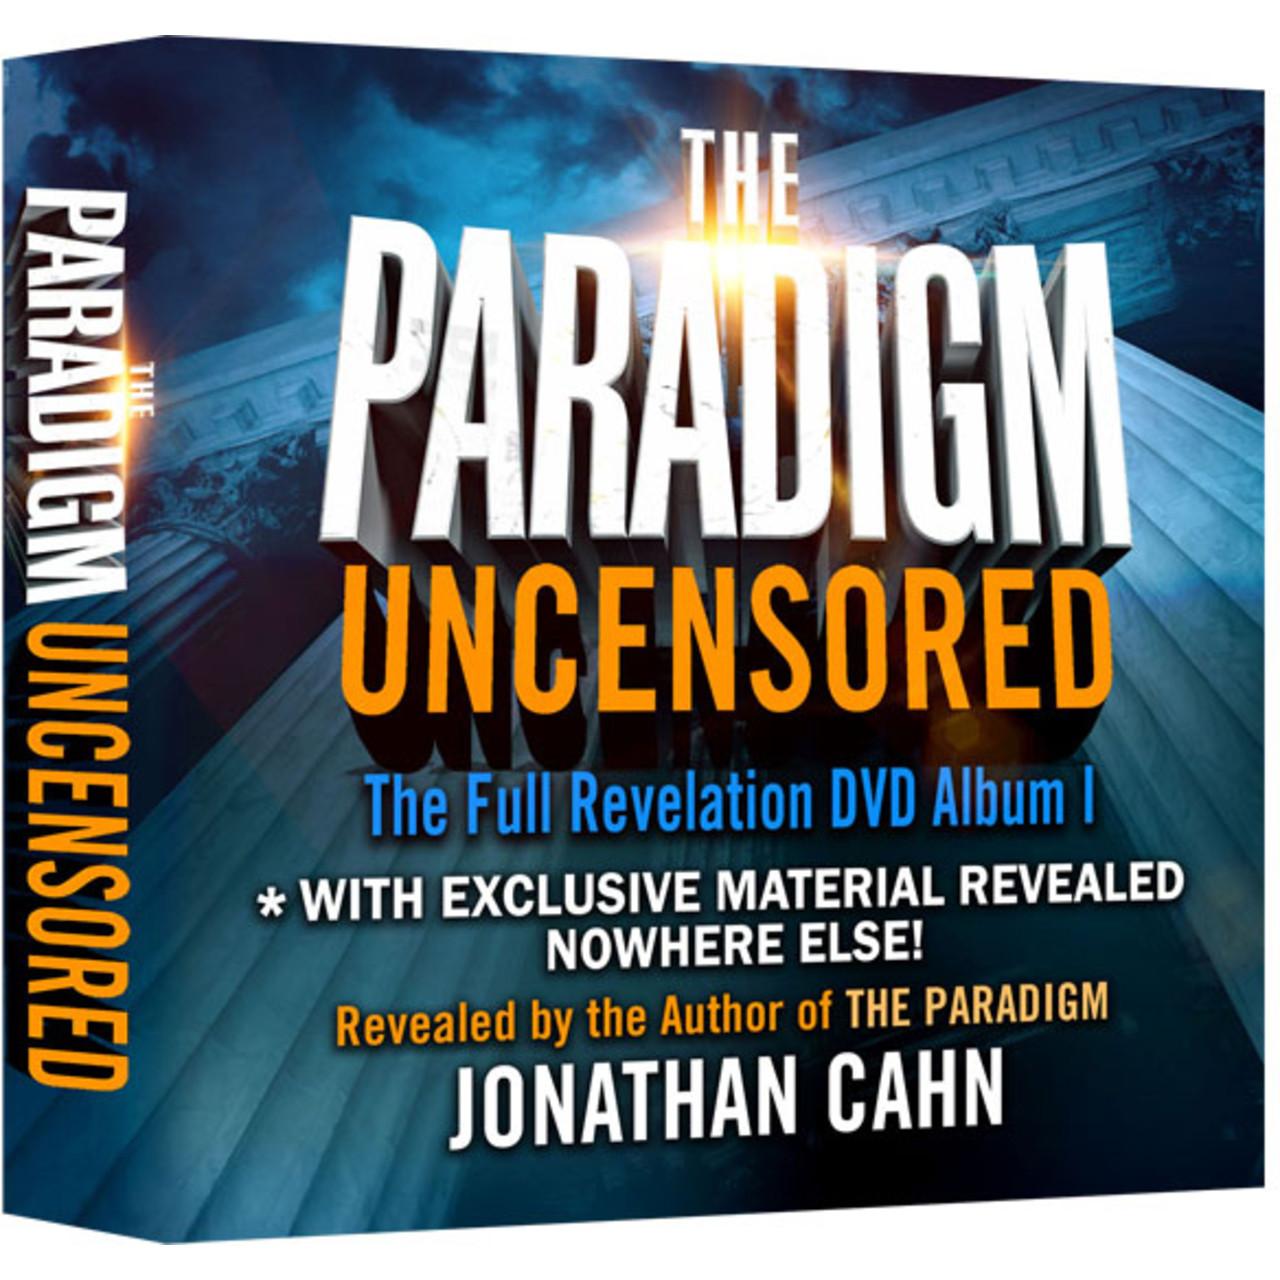 The paradigm uncensored part 1 4 dvd set jewish voice the paradigm uncensored part 1 4 dvd set malvernweather Images